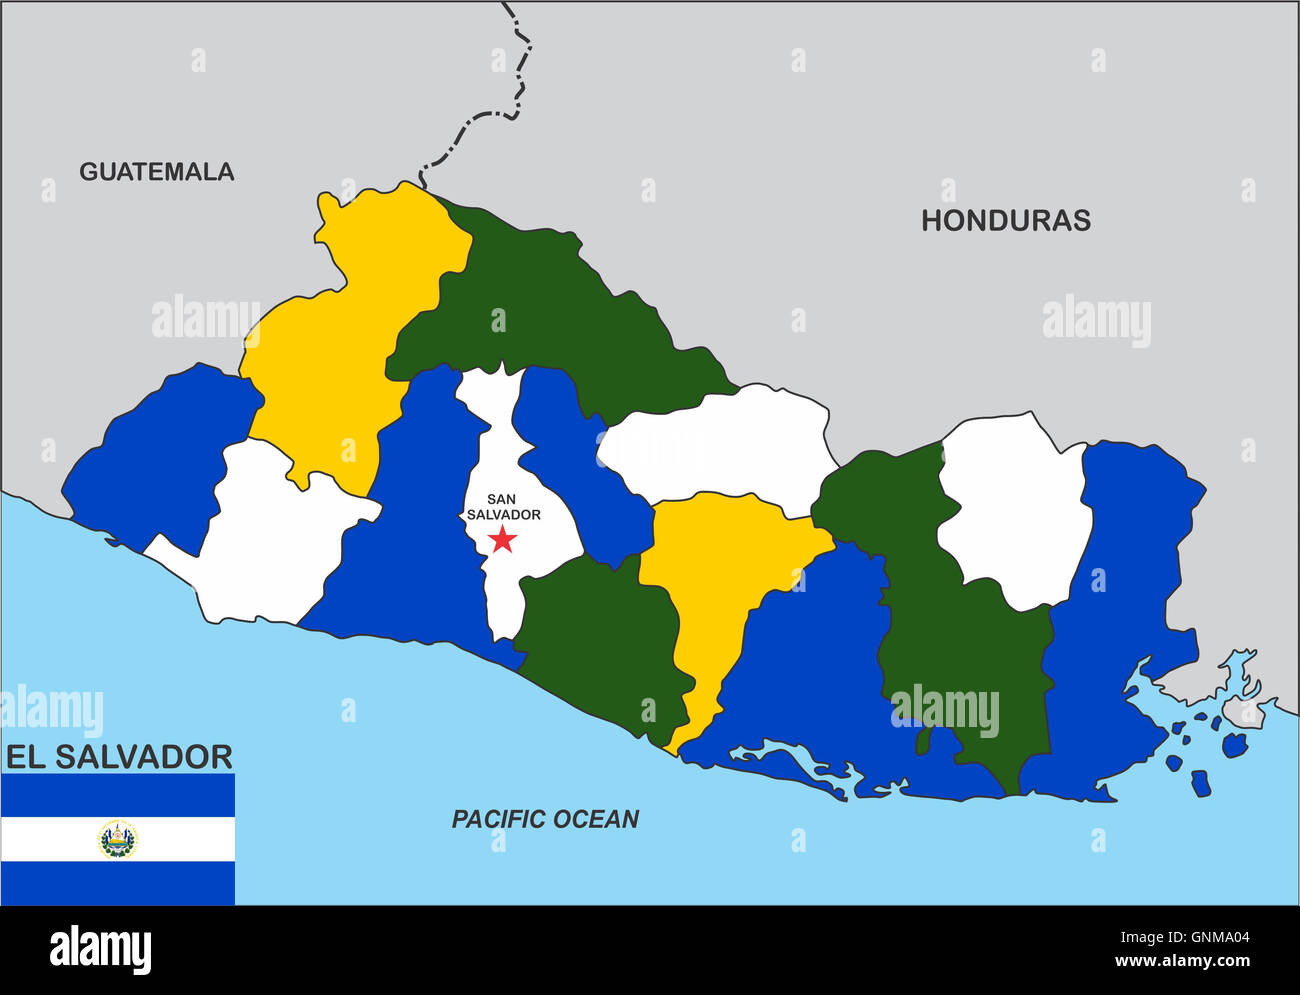 el salvador map Stock Photo: 116616868 - Alamy on georgetown on world map, costa rica on world map, el salvador map, cuba on world map, tenochtitlan on world map, recife on world map, panama on world map, tegucigalpa on world map, cabinda on world map, bahamas on world map, altamira on world map, santiago on world map, port of spain on world map, la habana on world map, salvador brazil on world map, arenal volcano on world map, santo domingo on world map, monterey world map, sanaa on world map, conakry on world map,